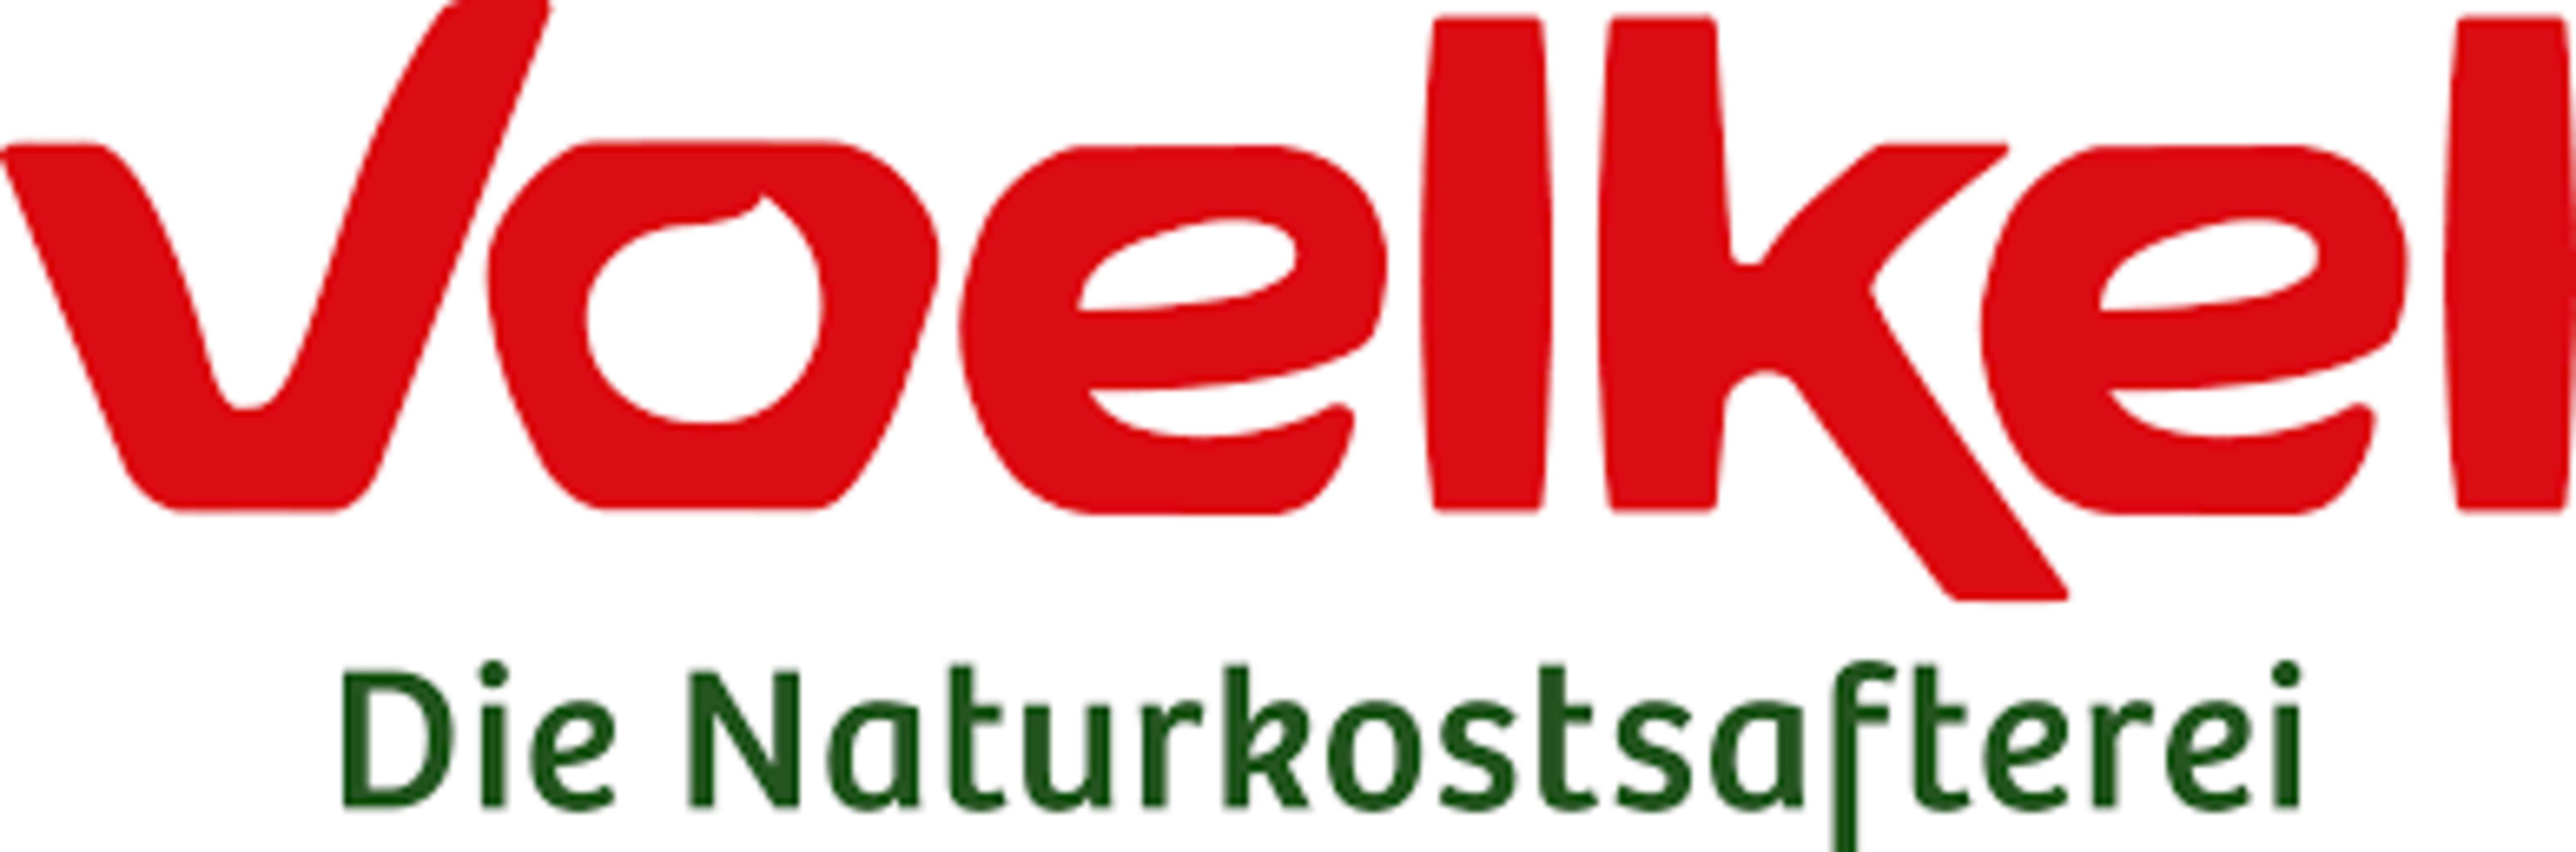 logo Voelkel GmbH